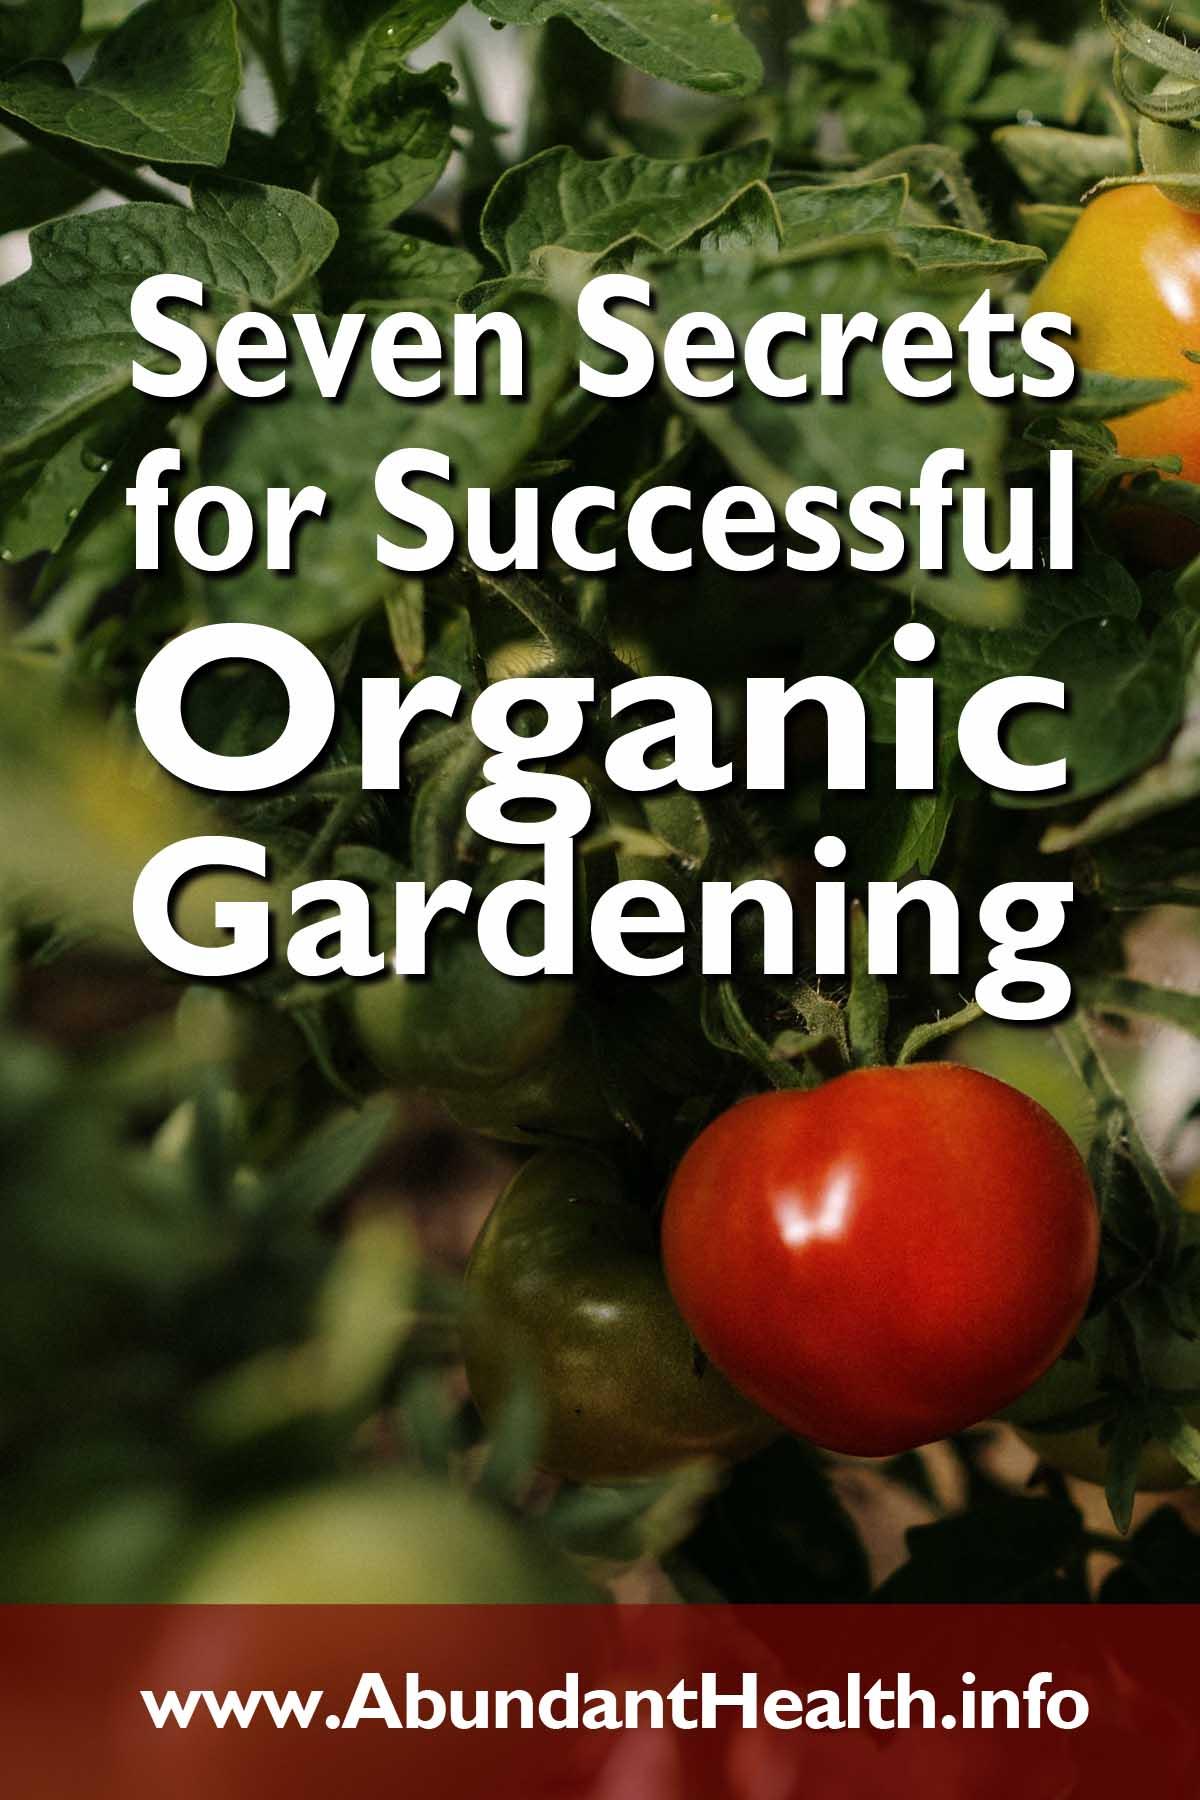 Seven Secrets for Successful Organic Gardening